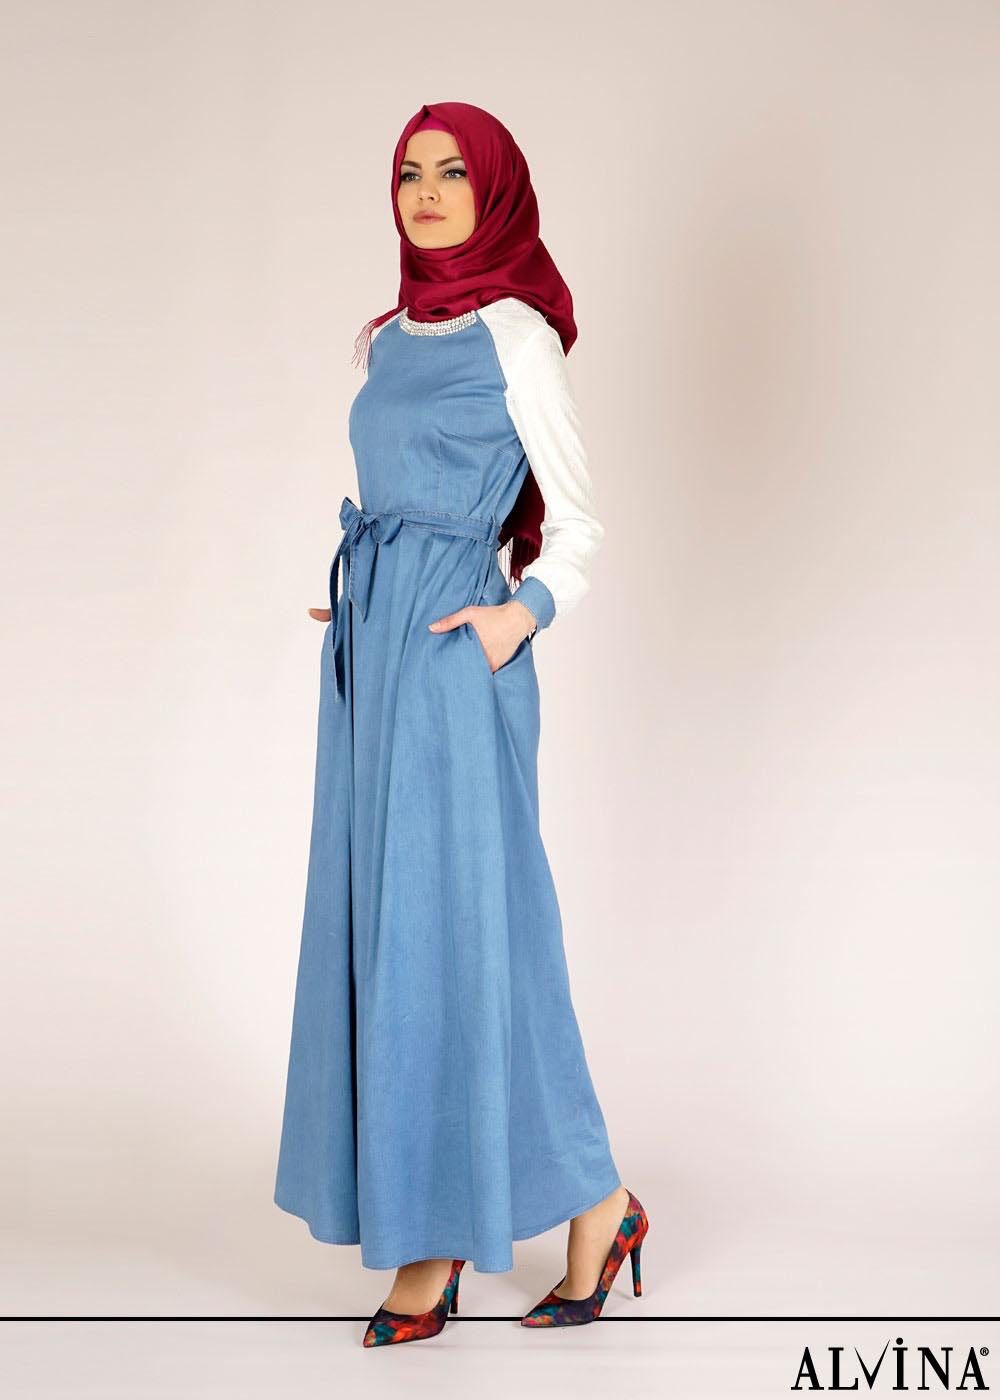 Pin by Banu Coskun on Hijab fashion   Pinterest   Hijabs, Hijab ...